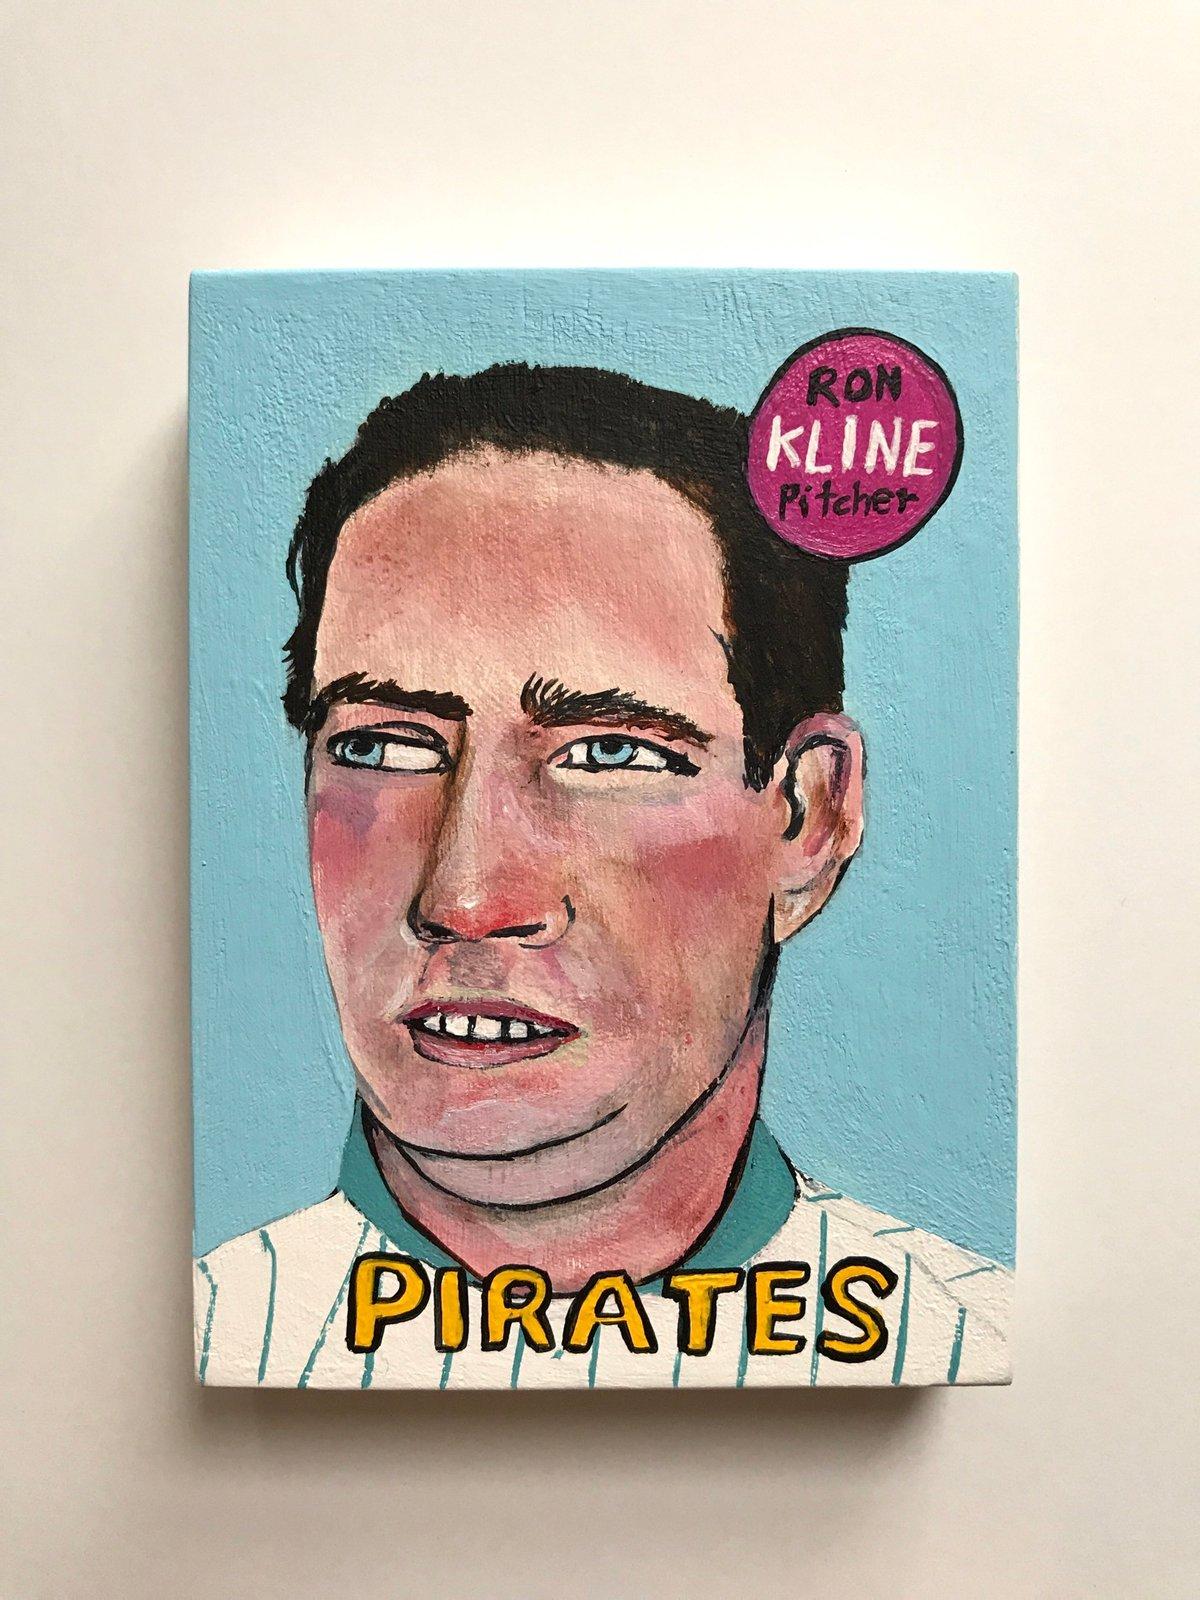 Image of Ron Kline, Pittsburg PIRATES